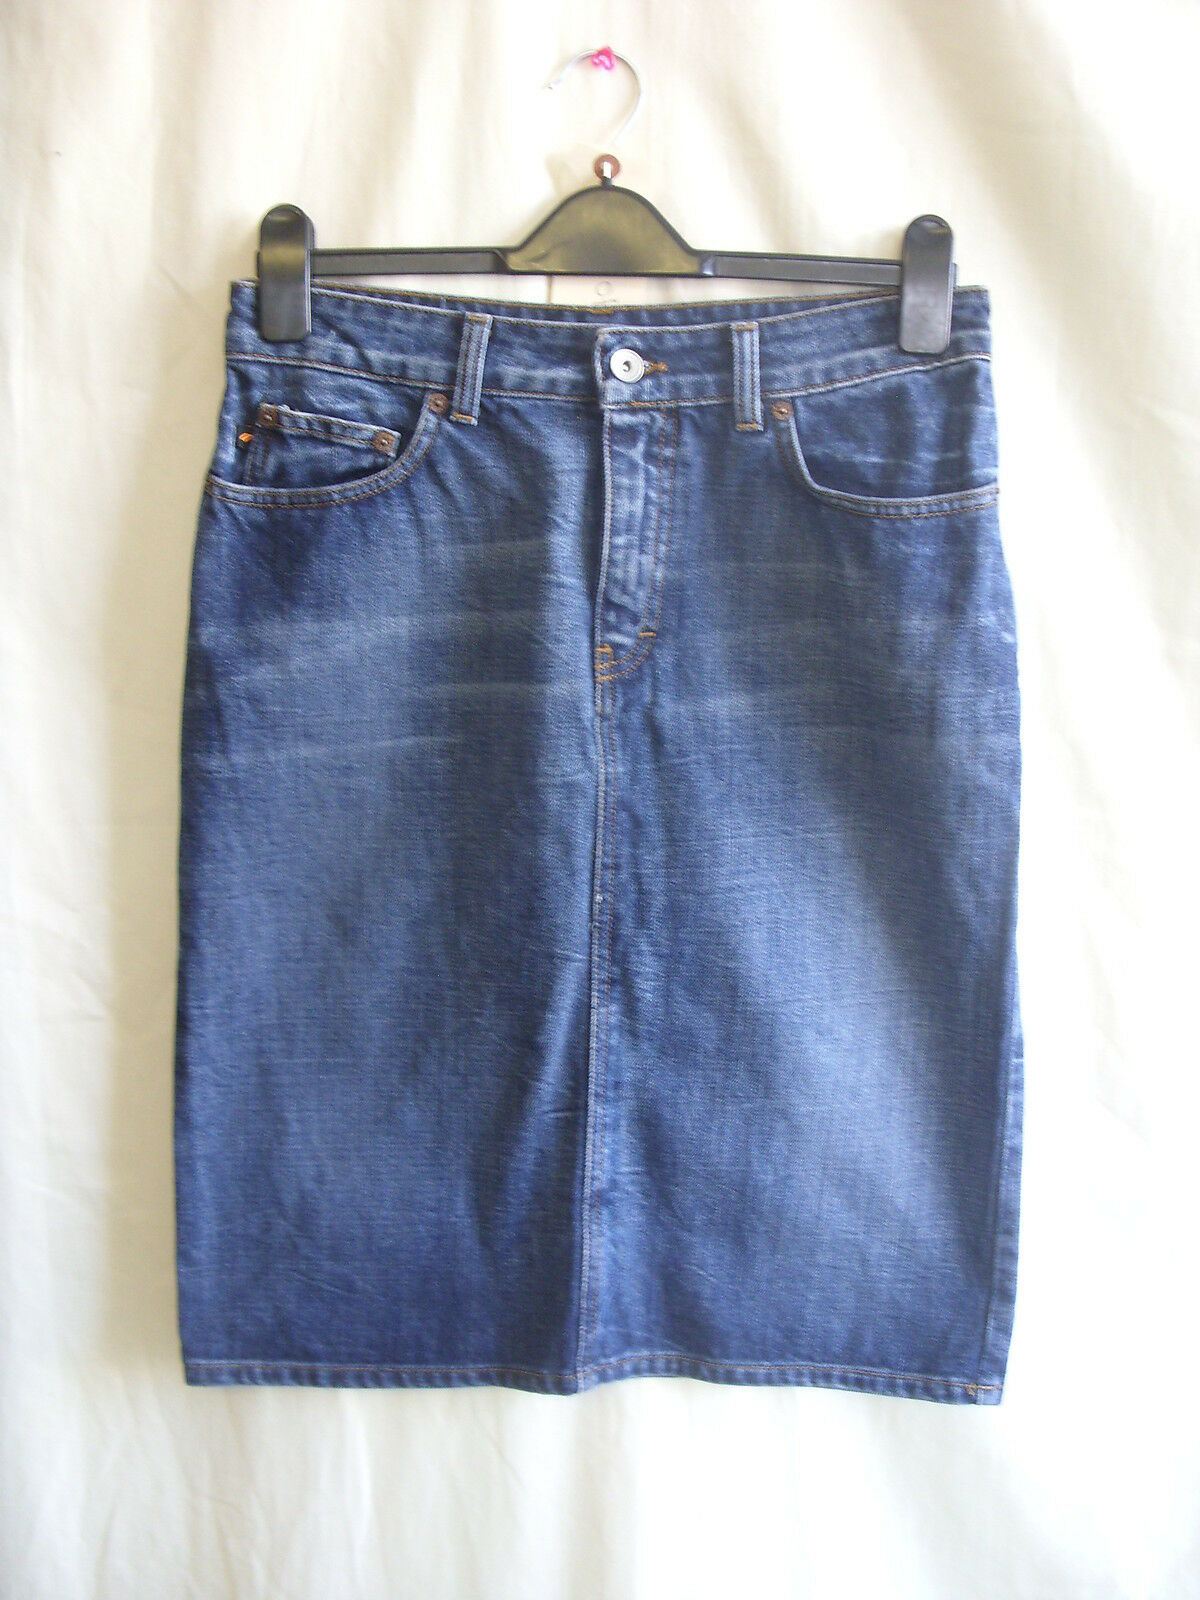 Ladies Skirt - DKNY, size 8, 31  waist, dark bluee denim, knee, casual cool 0898